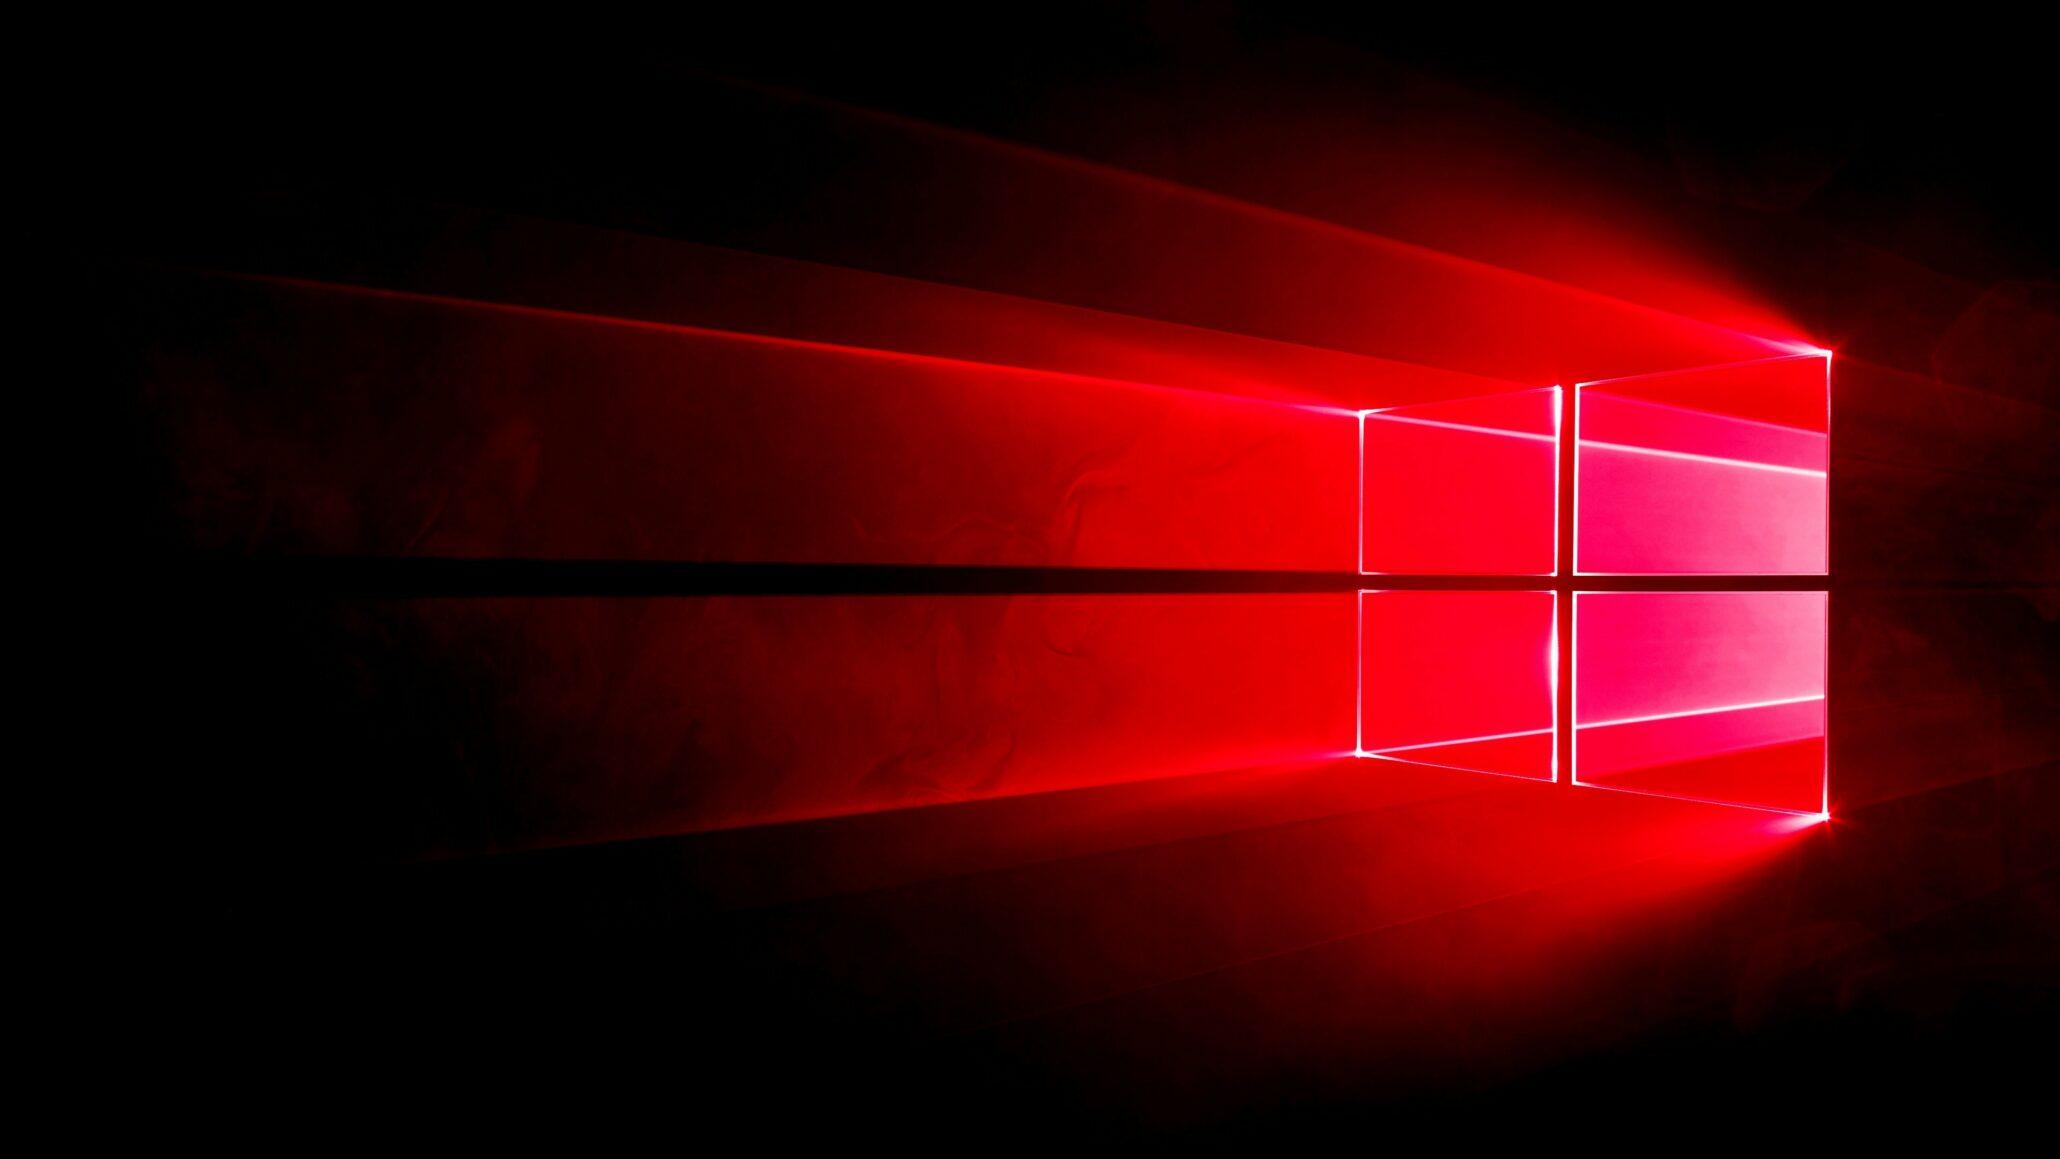 Microsoft Sends A New Windows 10 Redstone 5 Preview Build